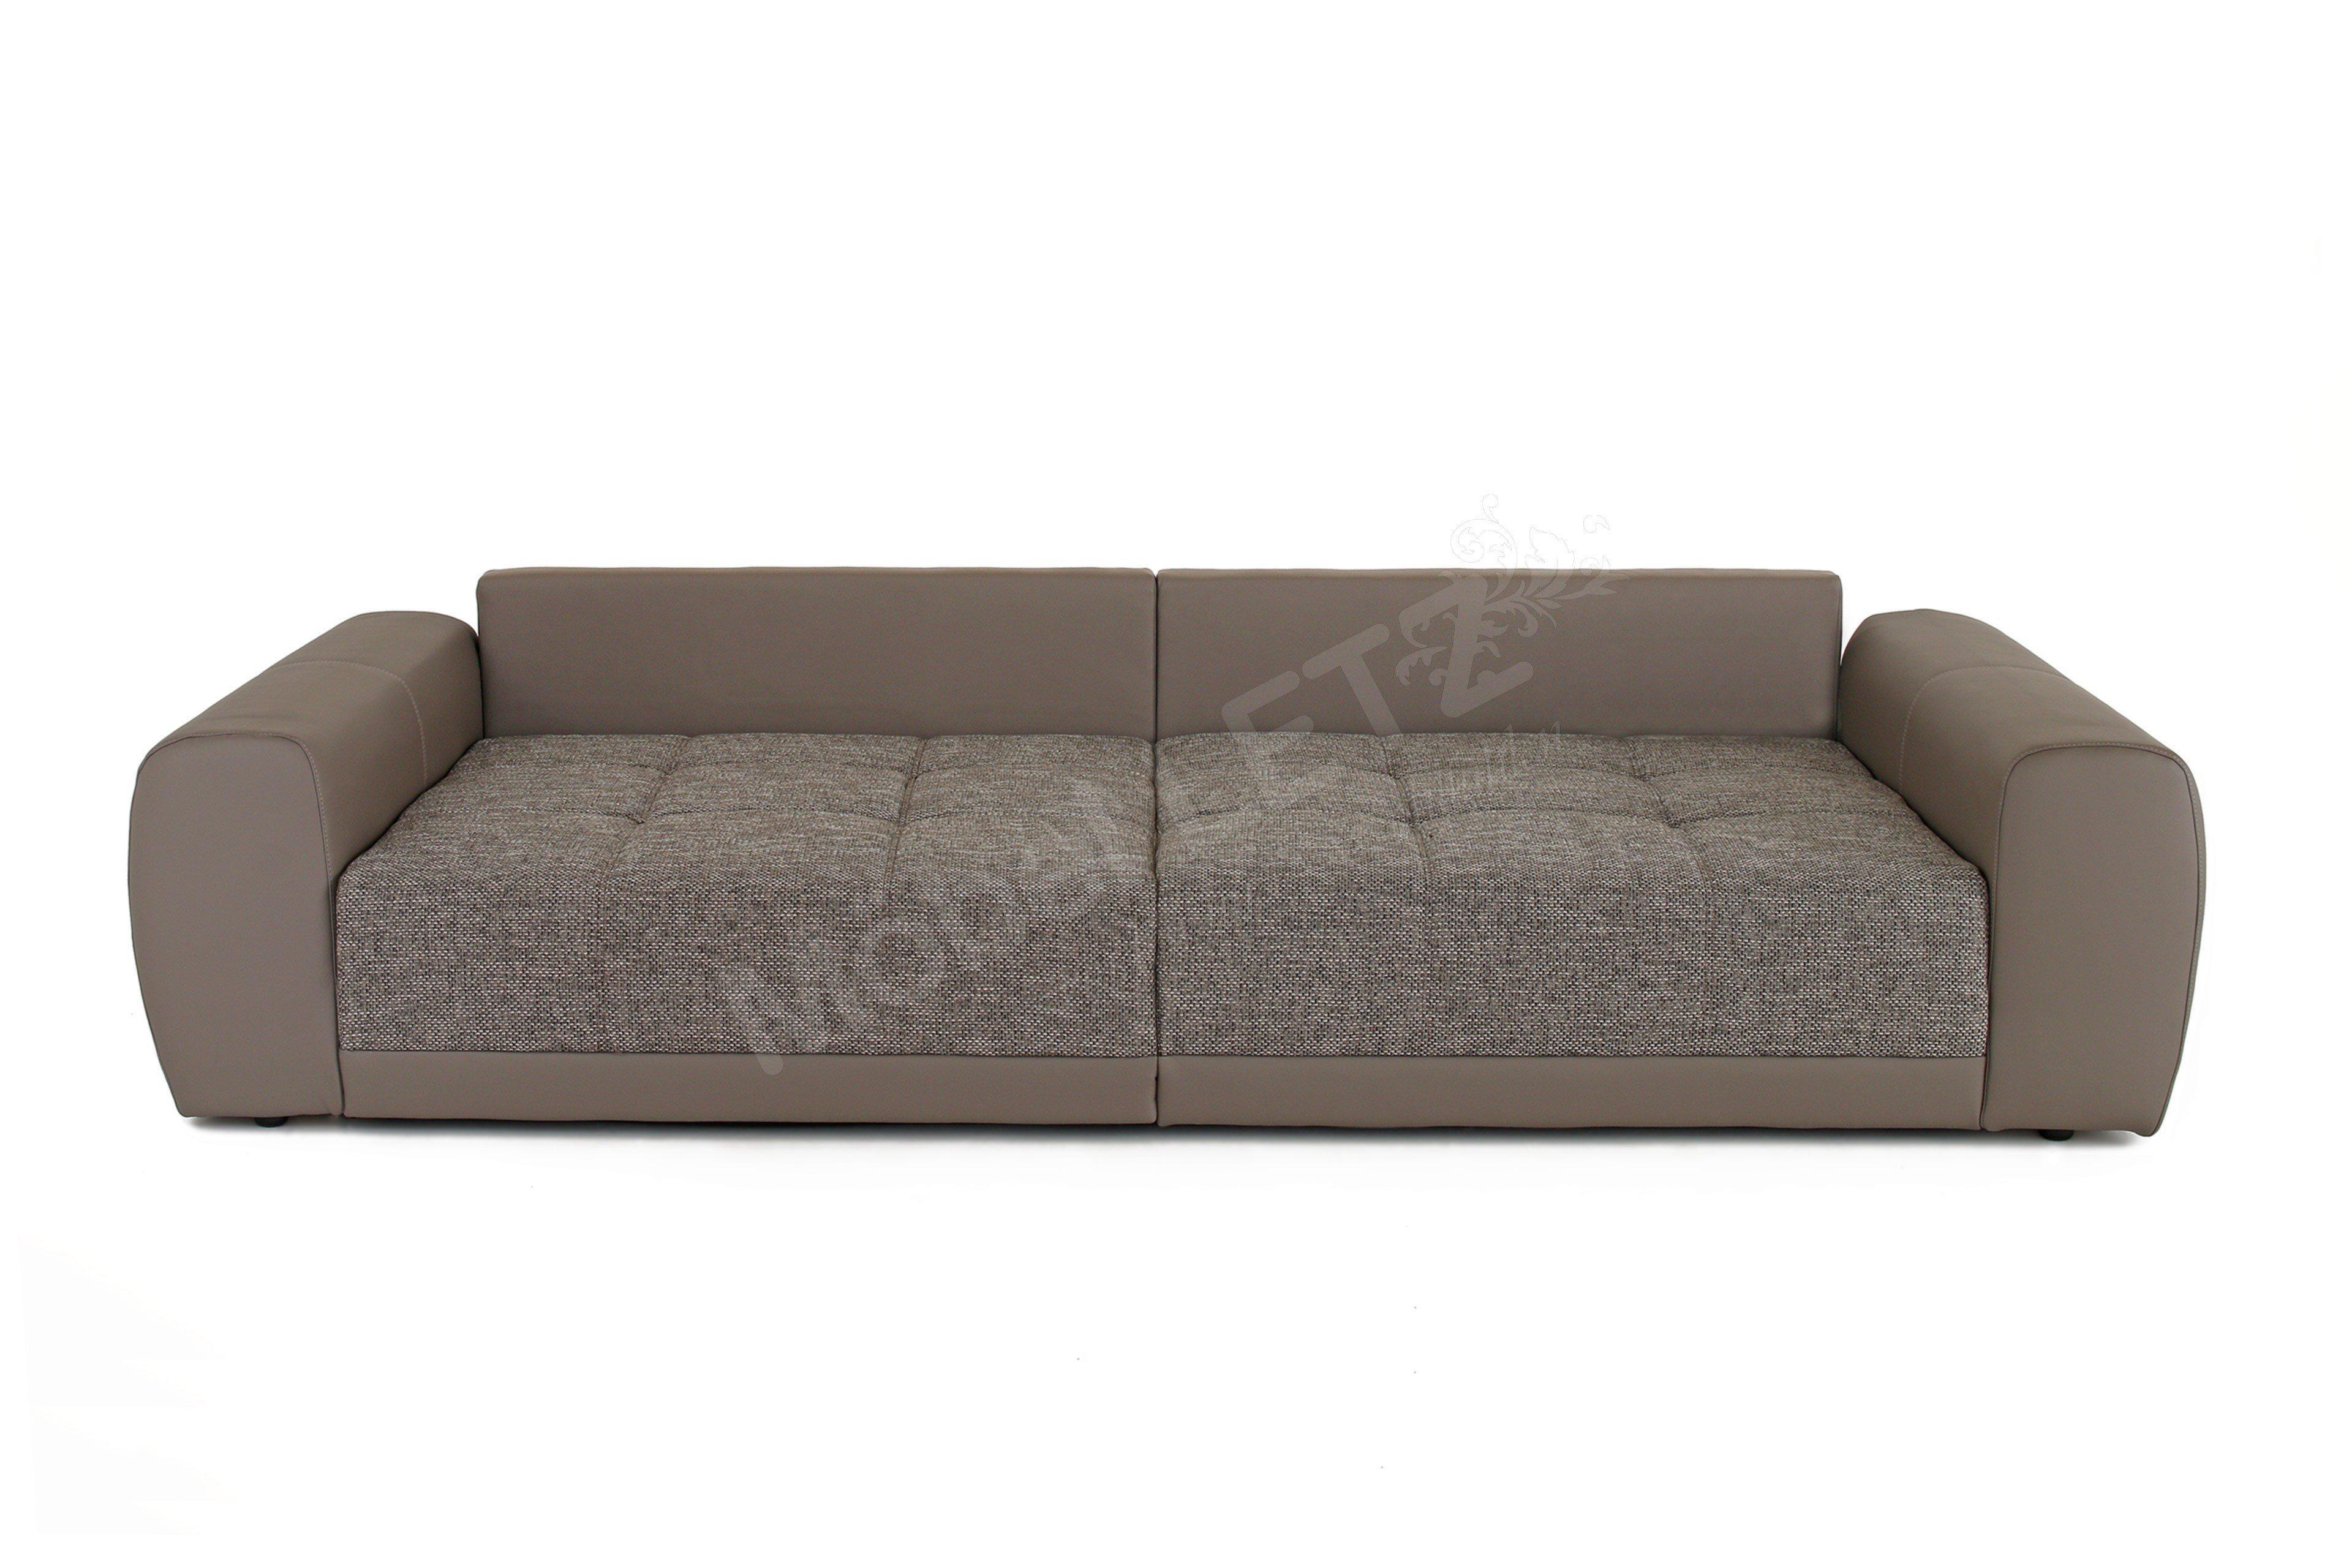 jockenh fer samy sofa in braun m bel letz ihr online shop. Black Bedroom Furniture Sets. Home Design Ideas